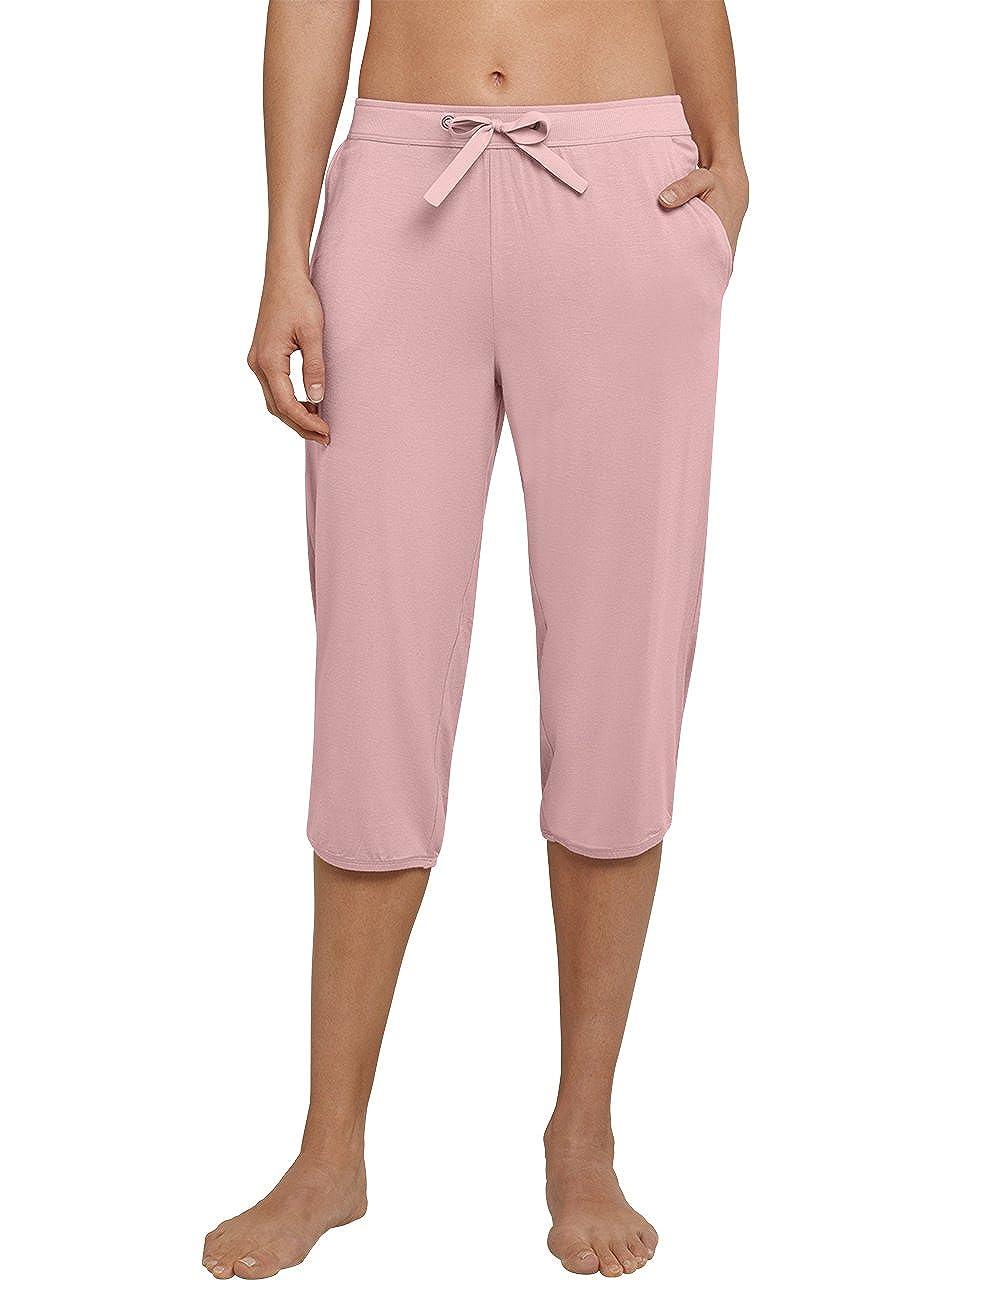 TALLA 38. Schiesser Pantalones de Pijama para Mujer